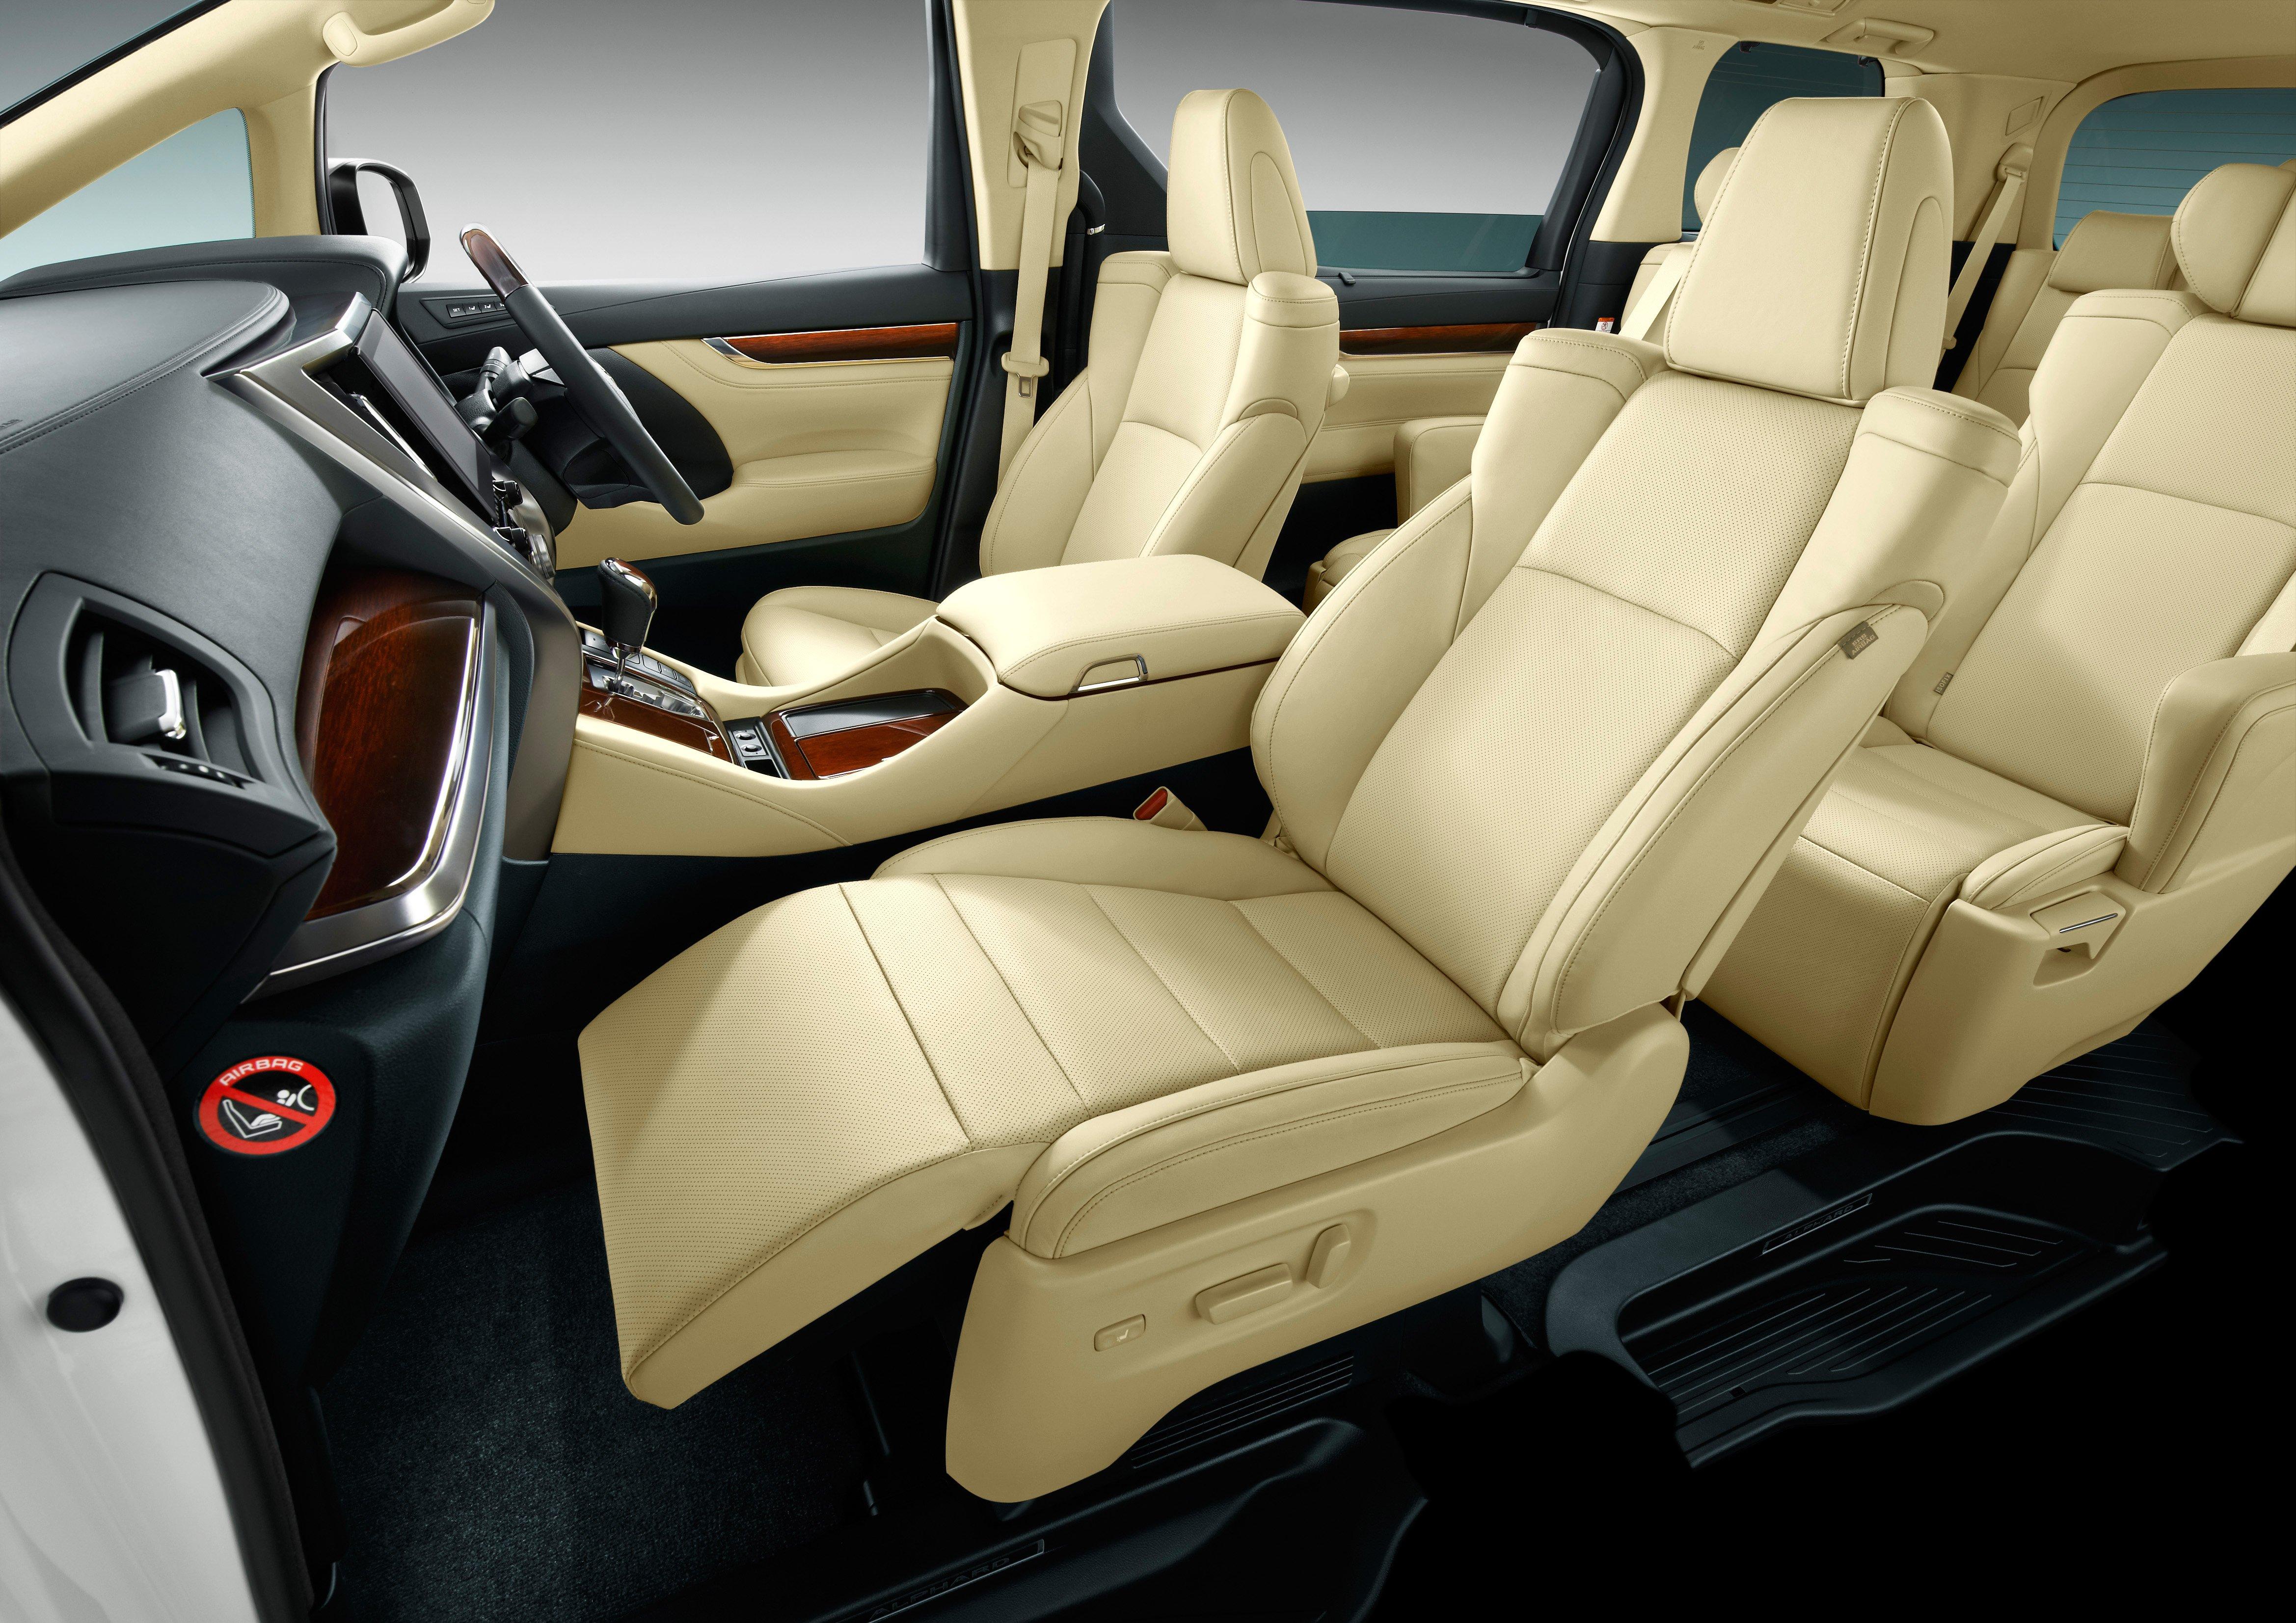 2015 Toyota Alphard And Vellfire Unveiled Full Details